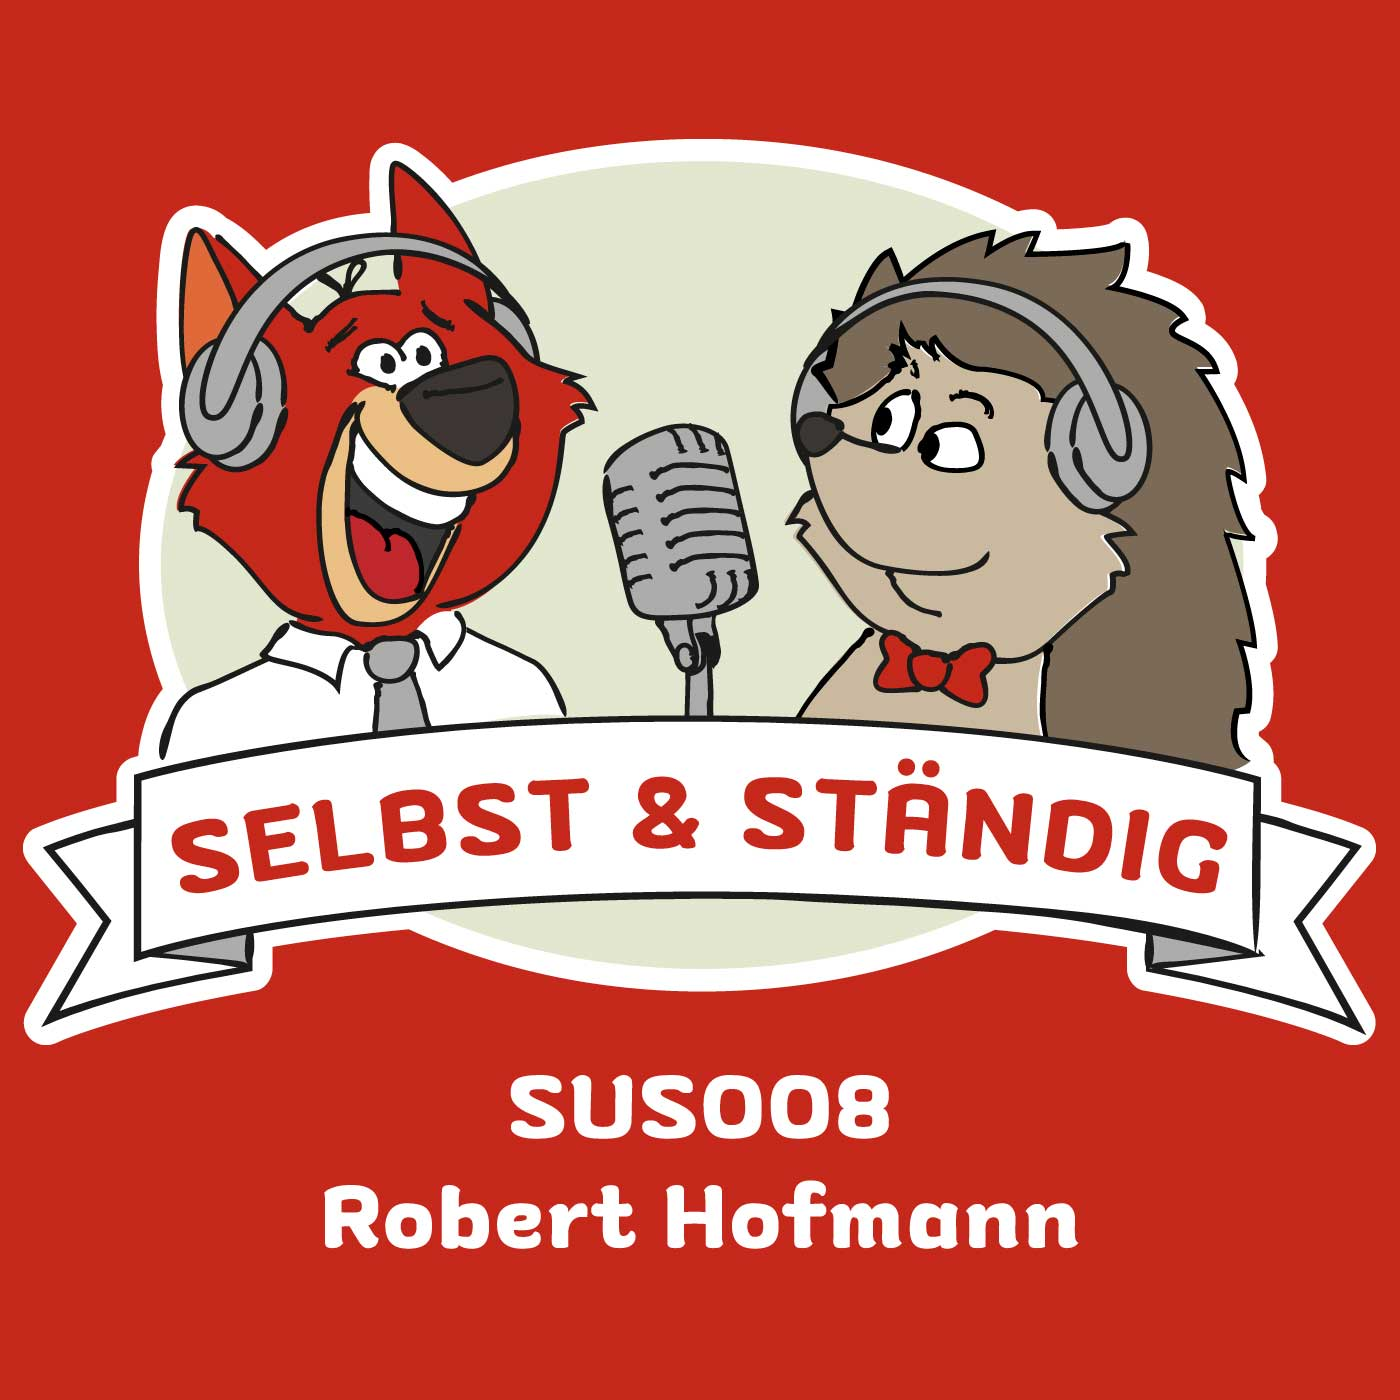 SUS008 Robert Hofmann